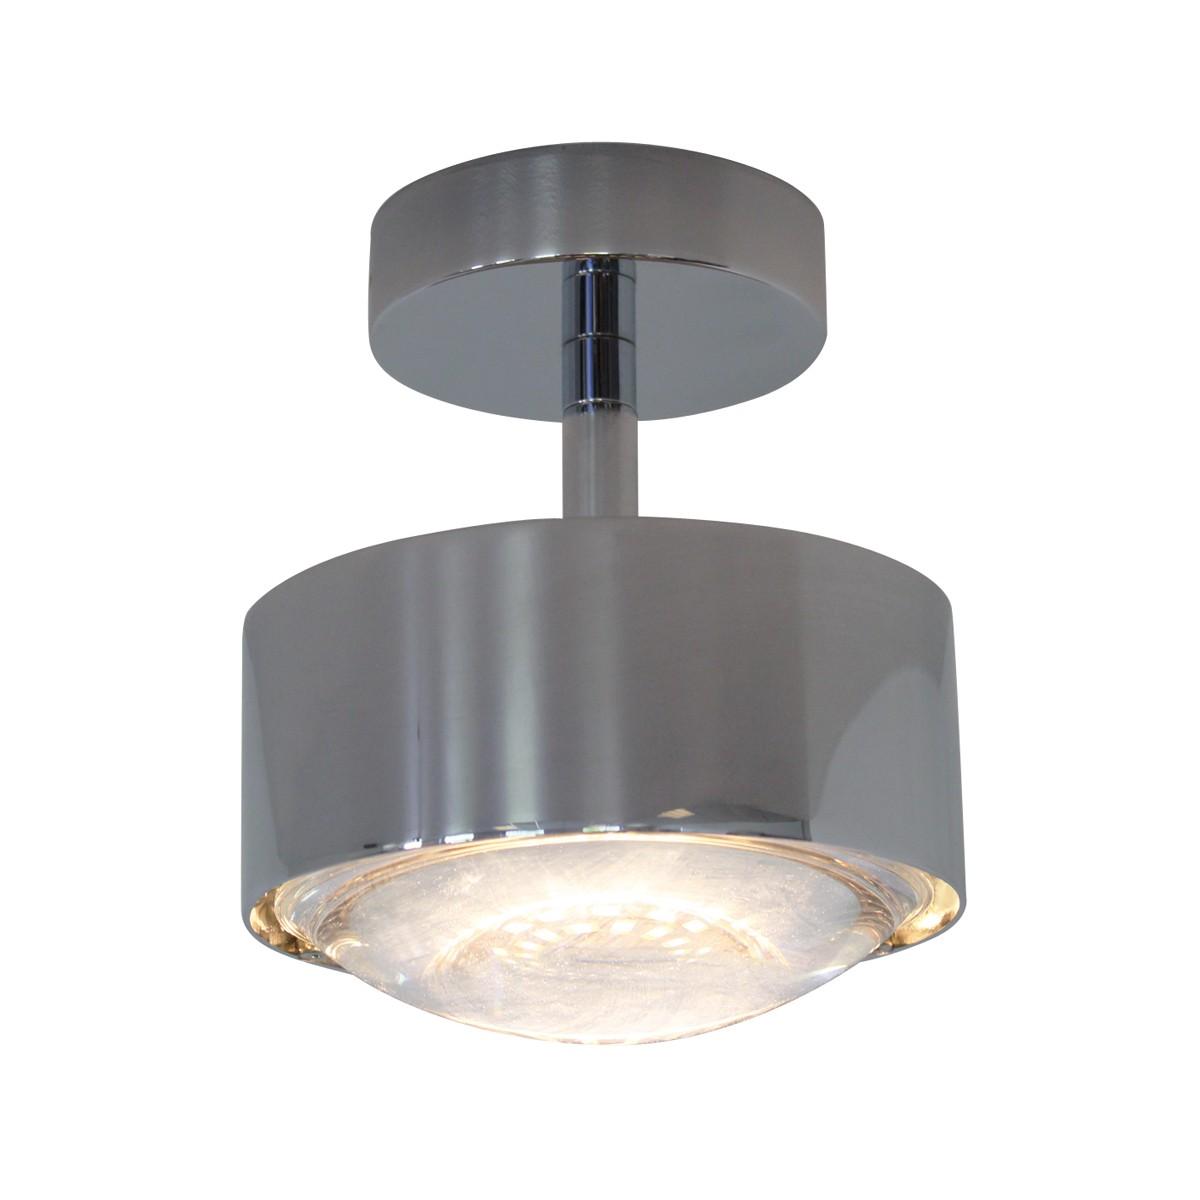 Top Light Puk Maxx Turn LED Downlight Deckenleuchte